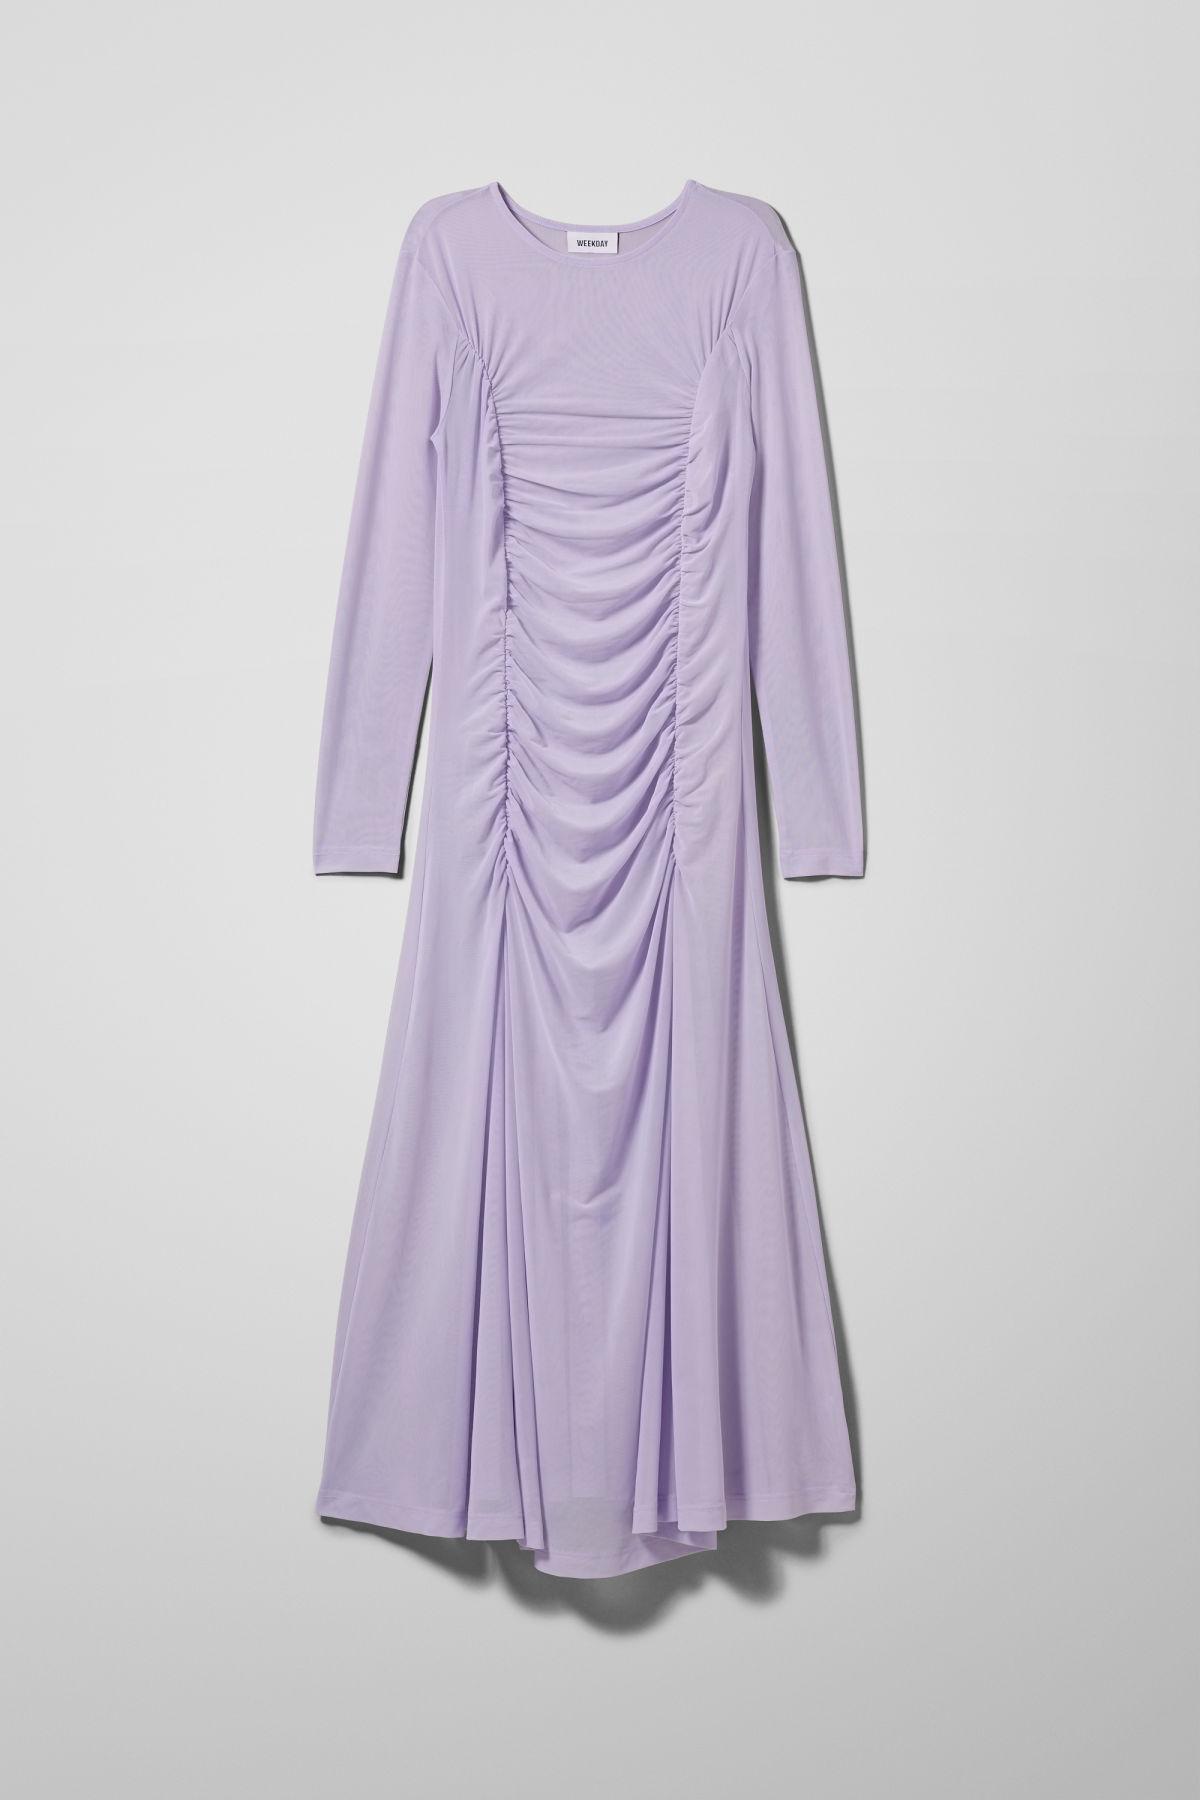 Image of Kaylee Mesh Dress - Purple-M